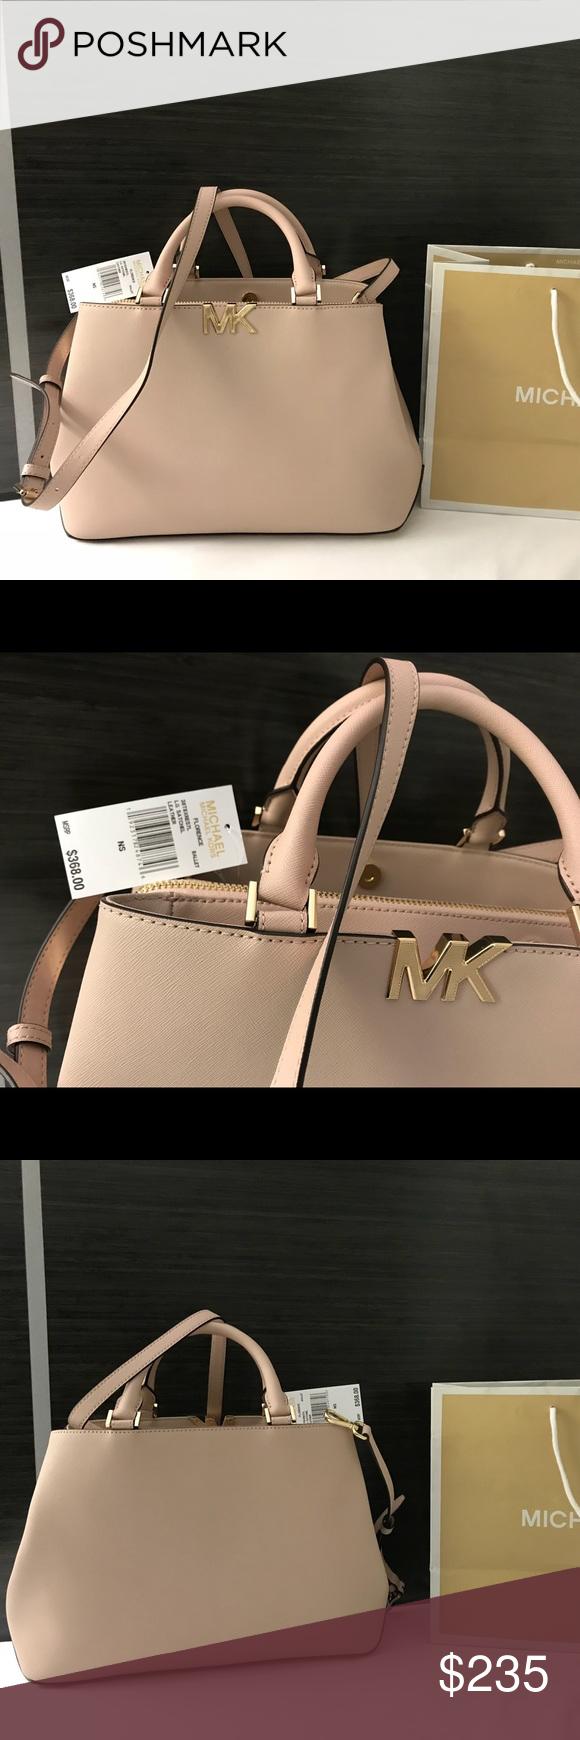 0bc119225c4e $368 Michael Kors Florence Handbag MK Bag Purse 🔥⏳ LAST 1! ⏳🔥 Guaranteed